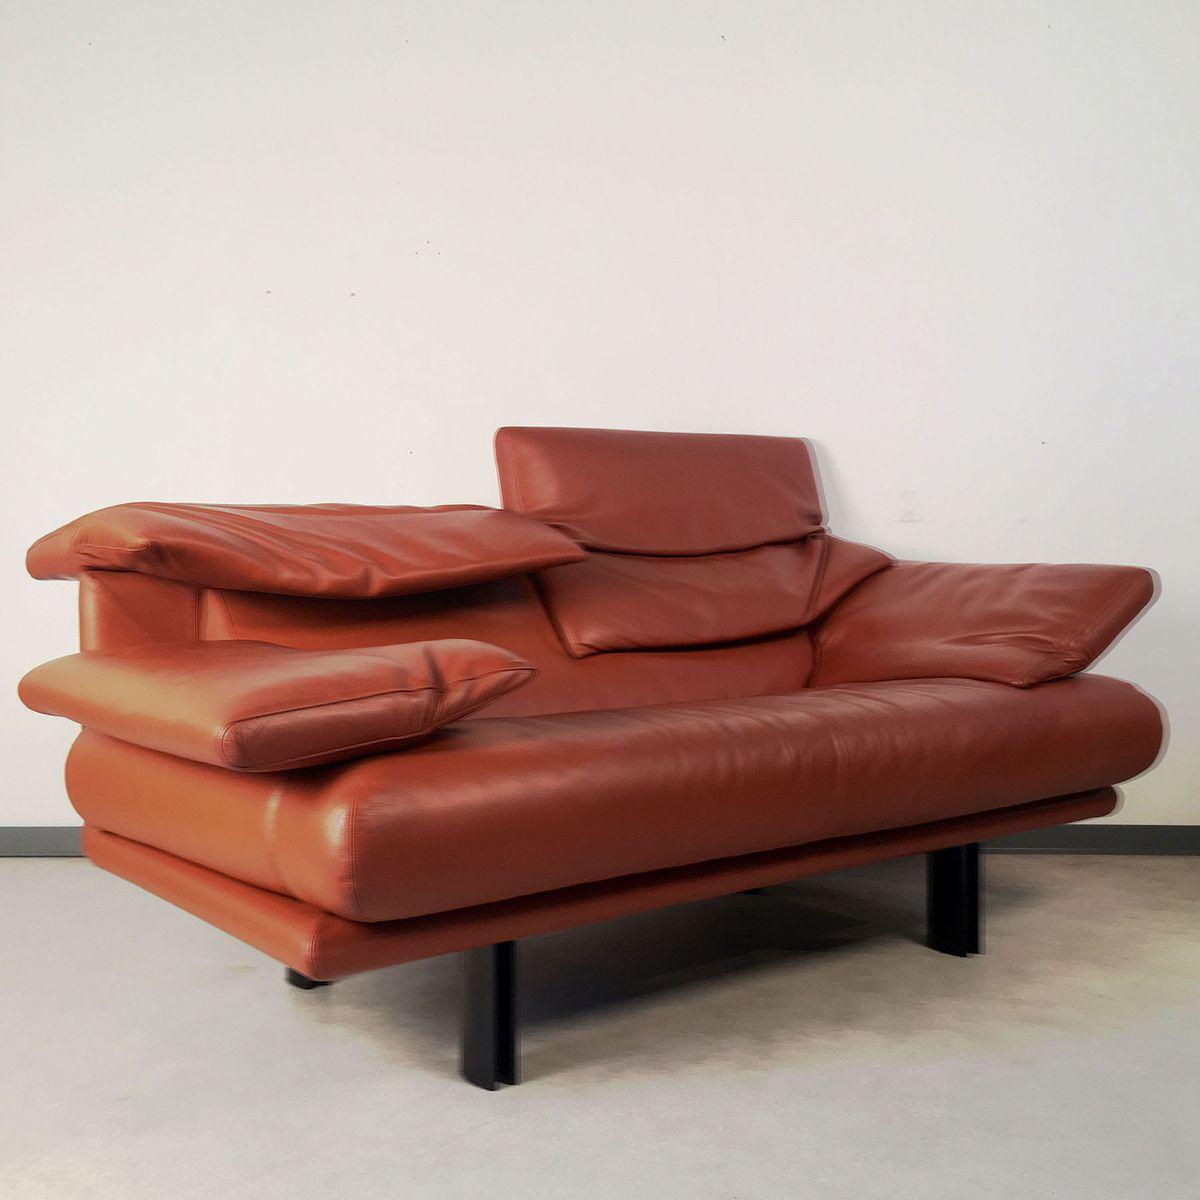 vintage alanda zwei sitzer sofa von paolo piva f r b b italia bei pamono kaufen. Black Bedroom Furniture Sets. Home Design Ideas